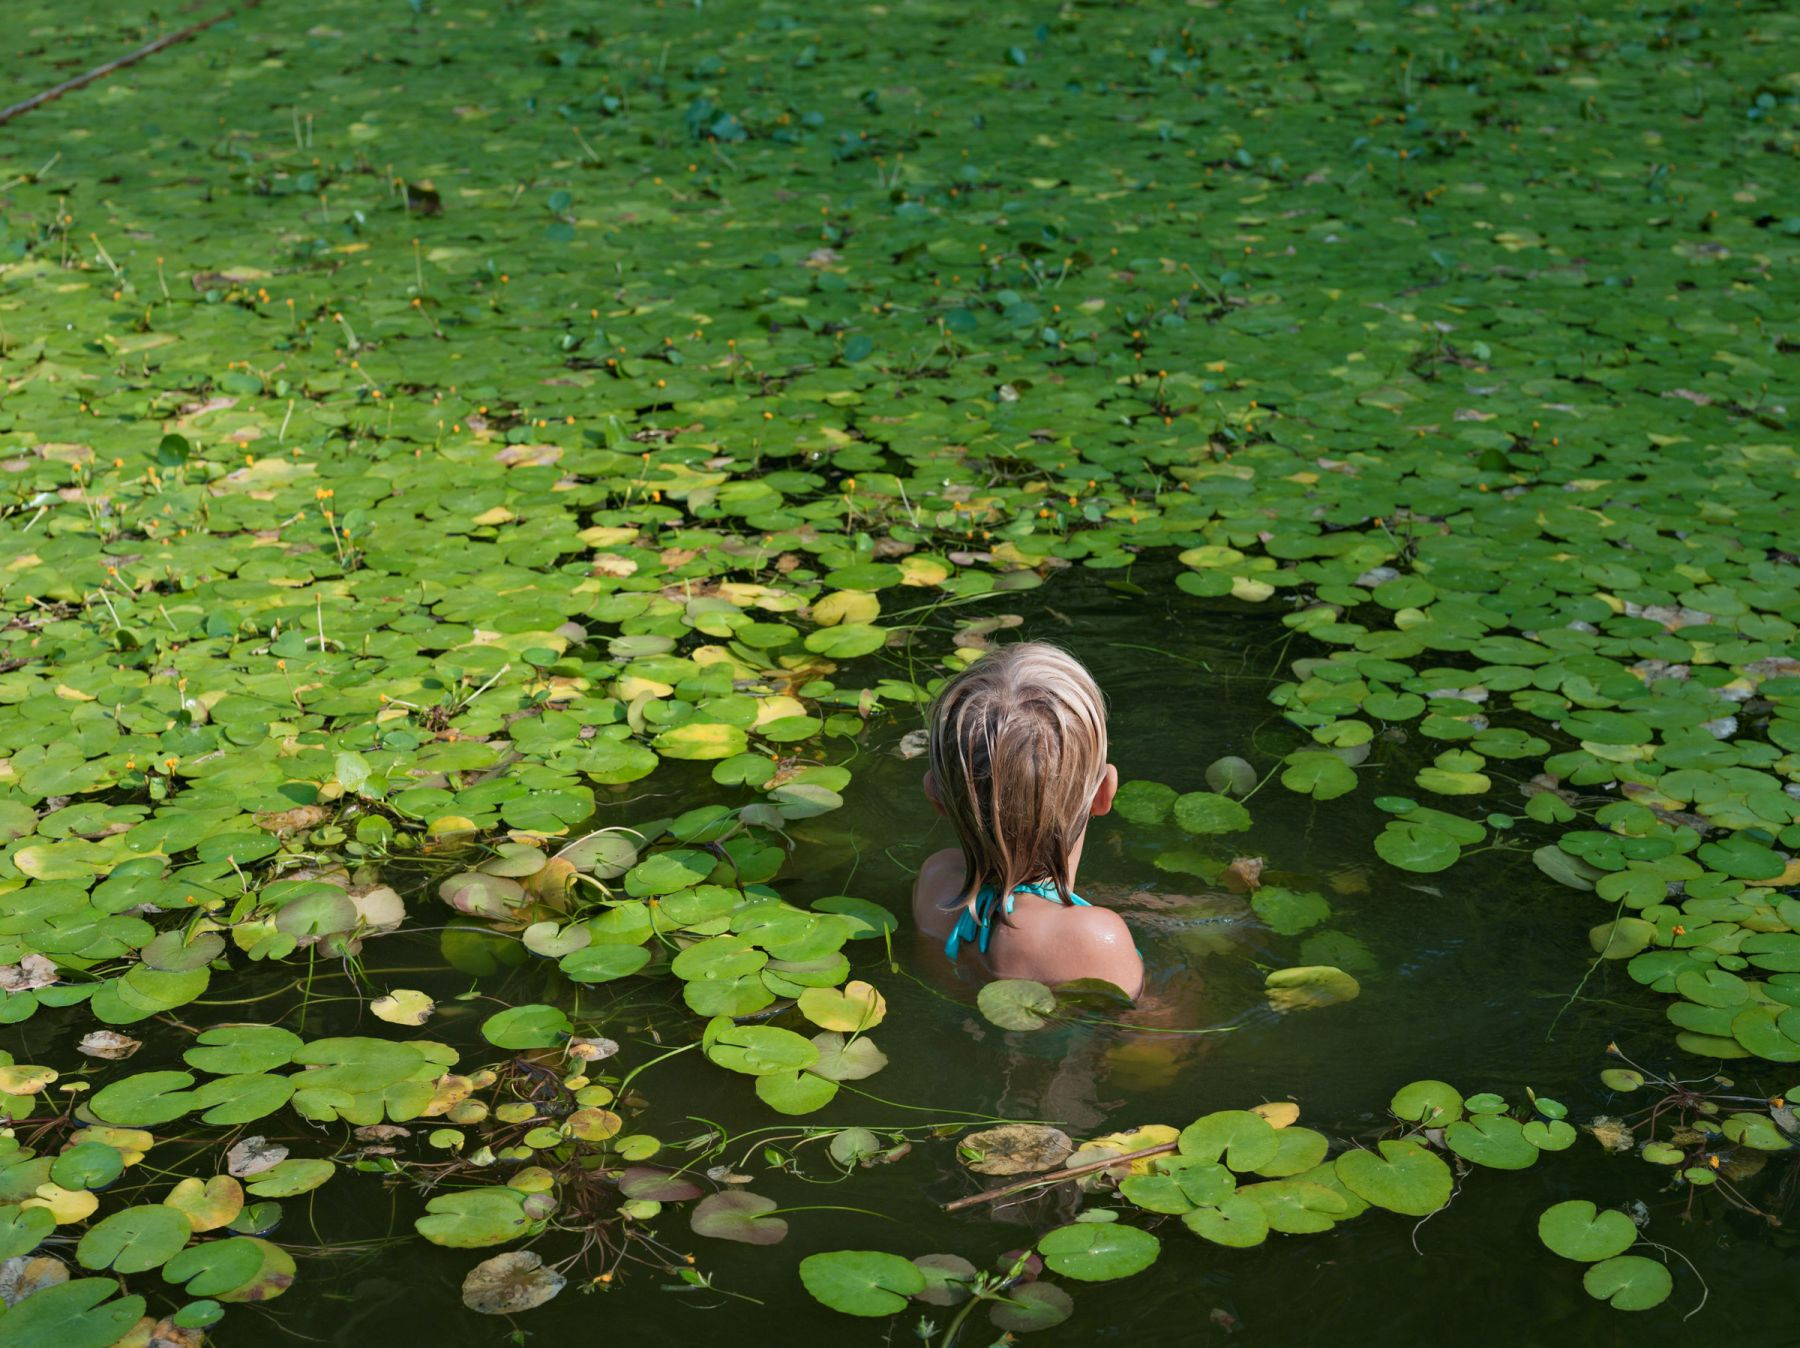 LUCAS FOGLIA Maddie with Invasive Water Lilies, North Carolina, 2008